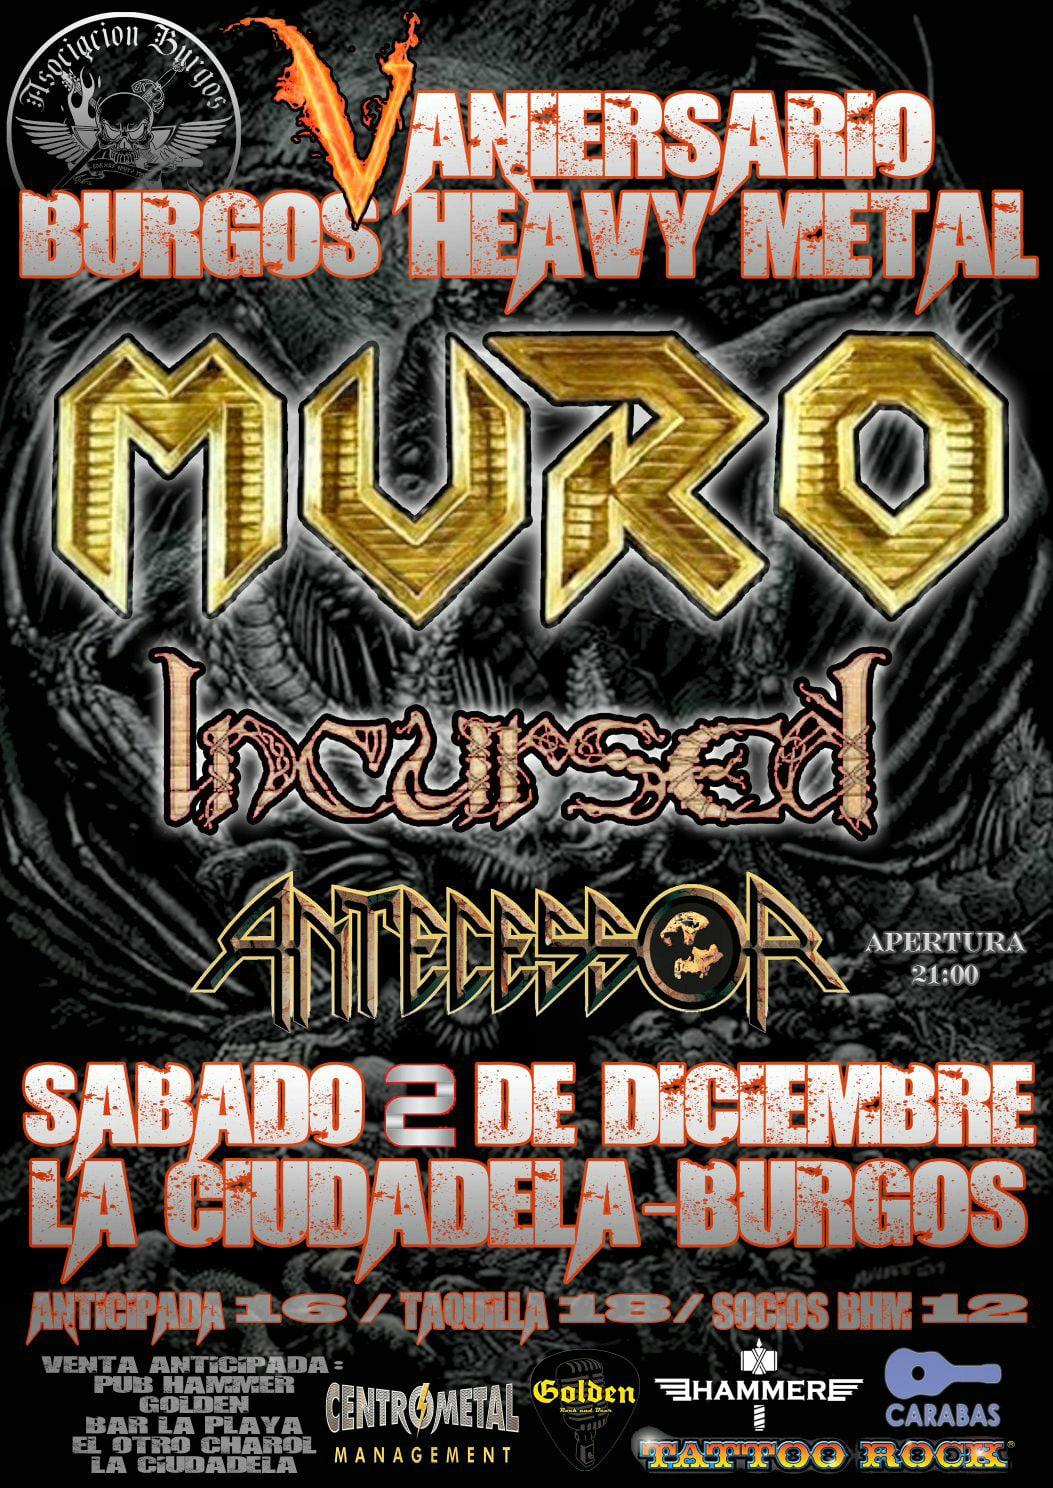 V aniversario Burgos